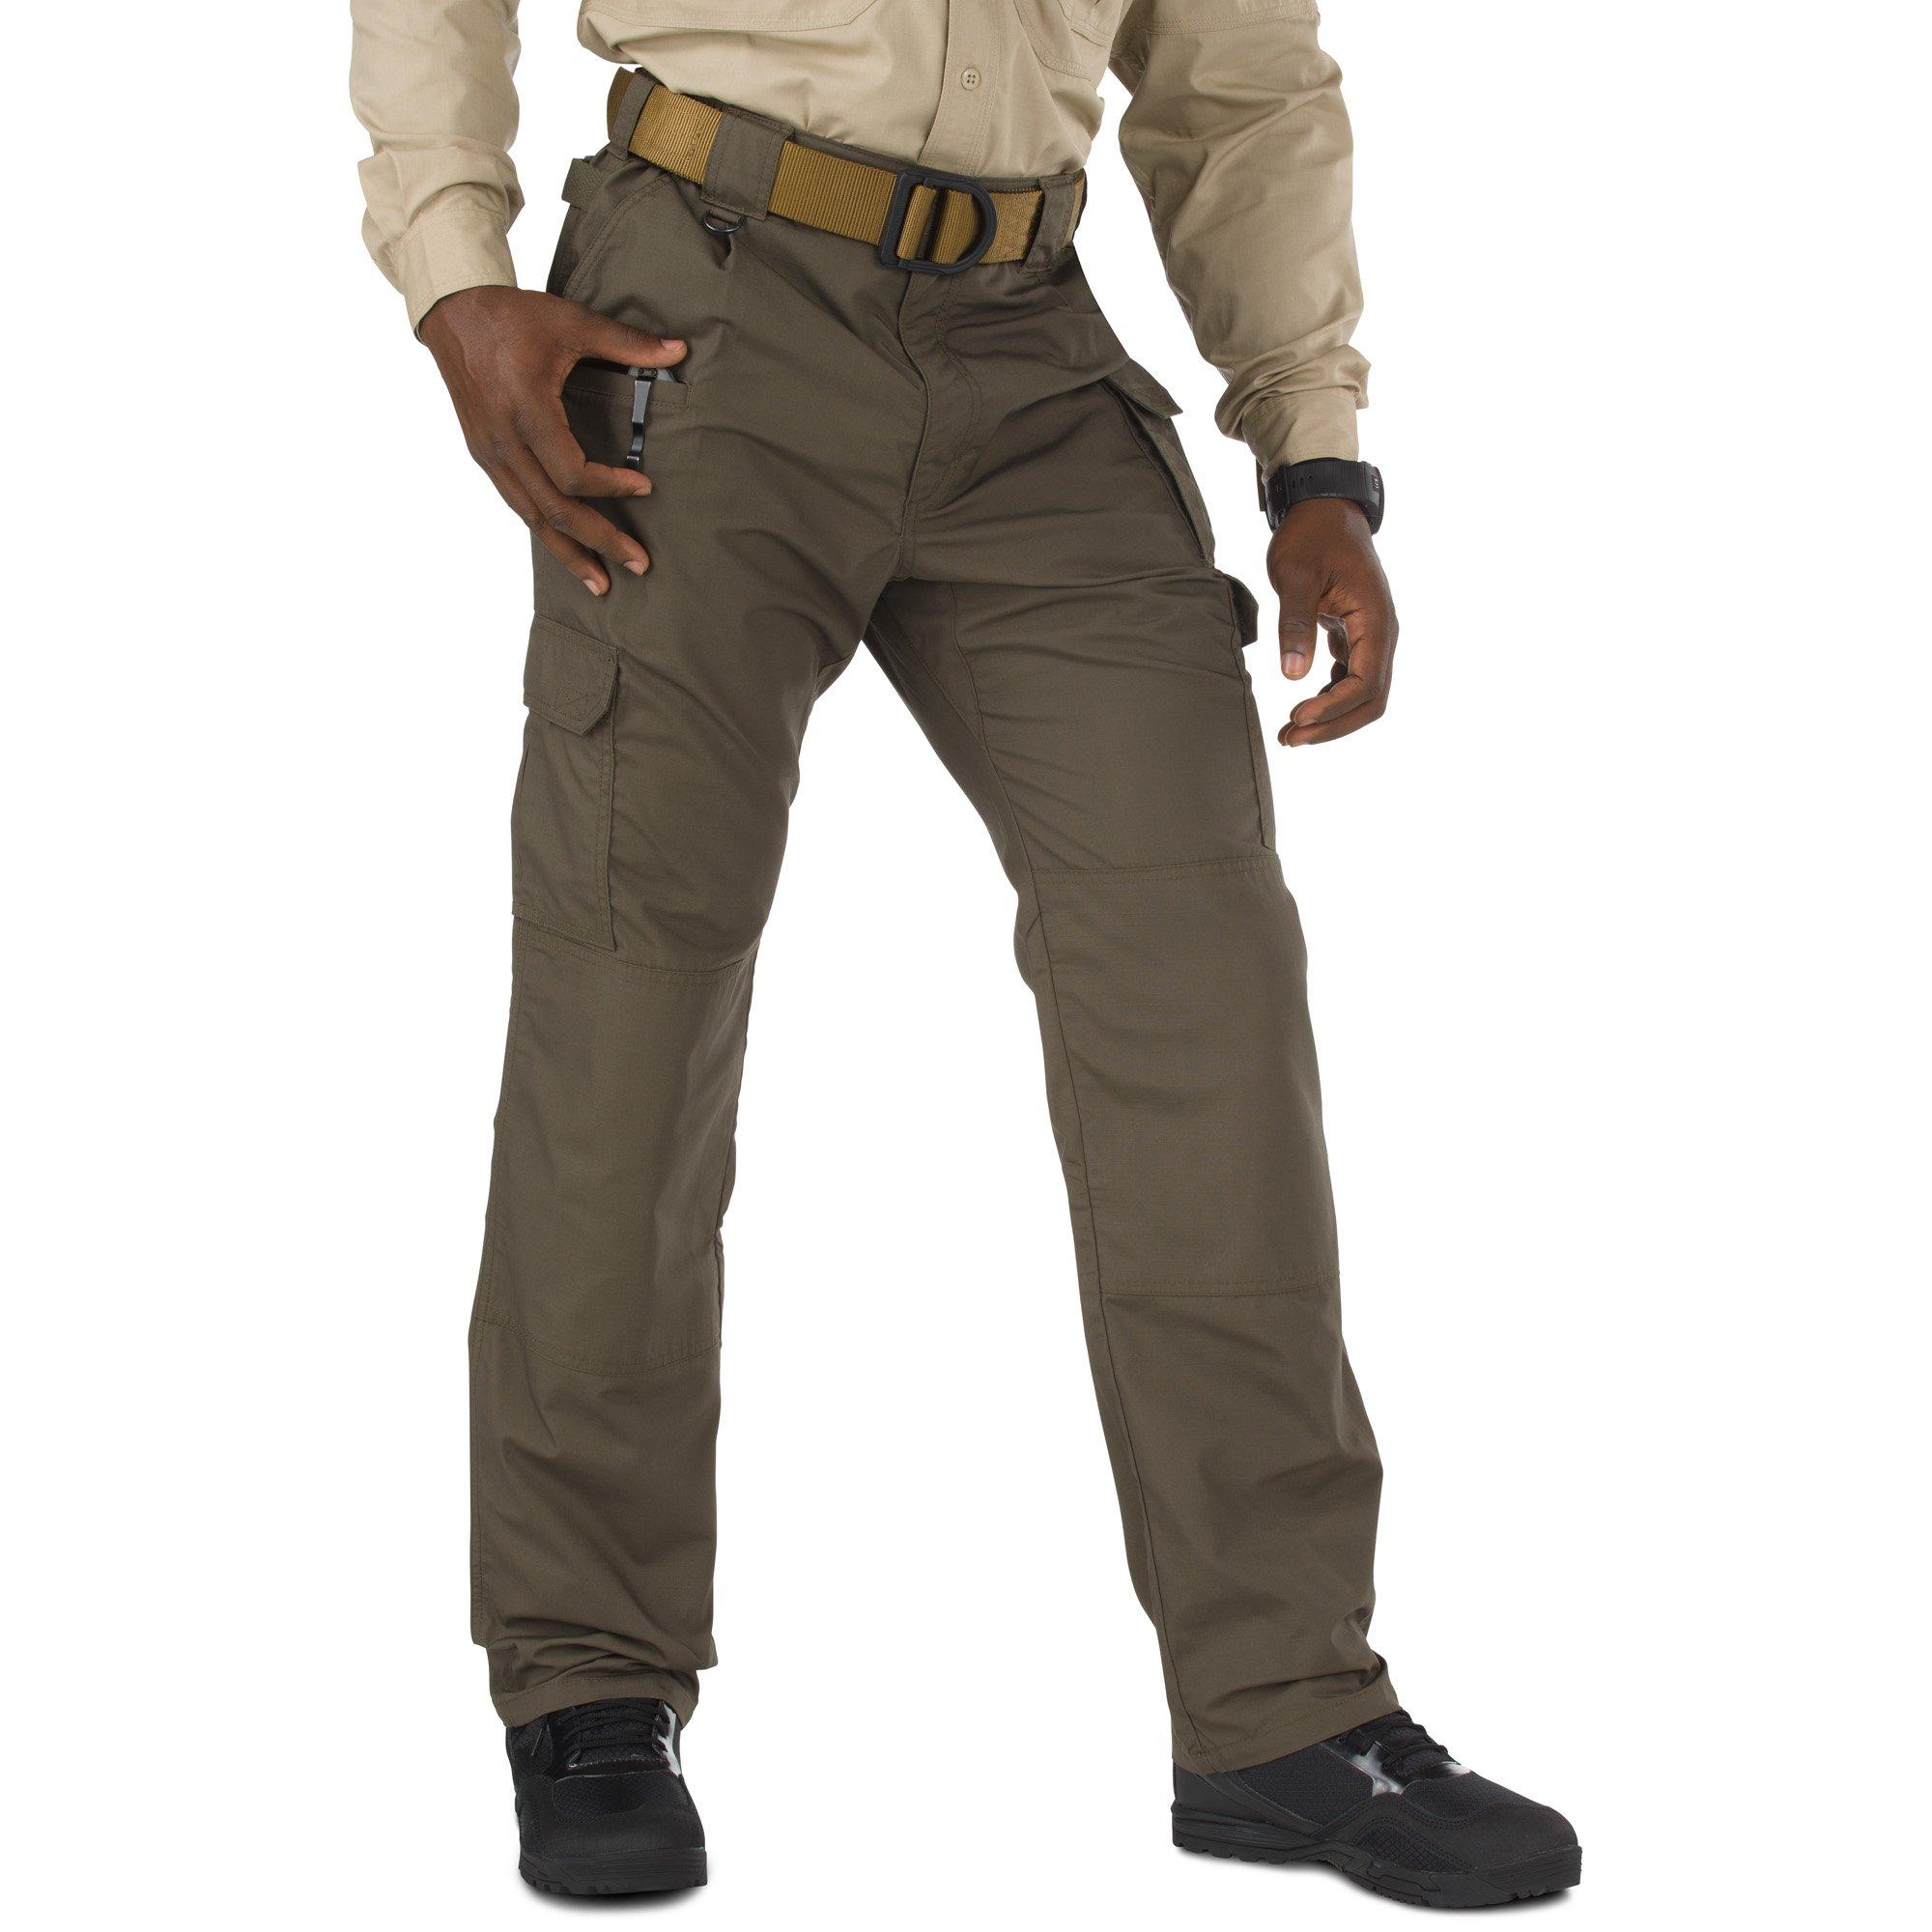 5.11 Men's Taclite Pro Tactical Pants, Style 74273, Tundra, 42Wx36L